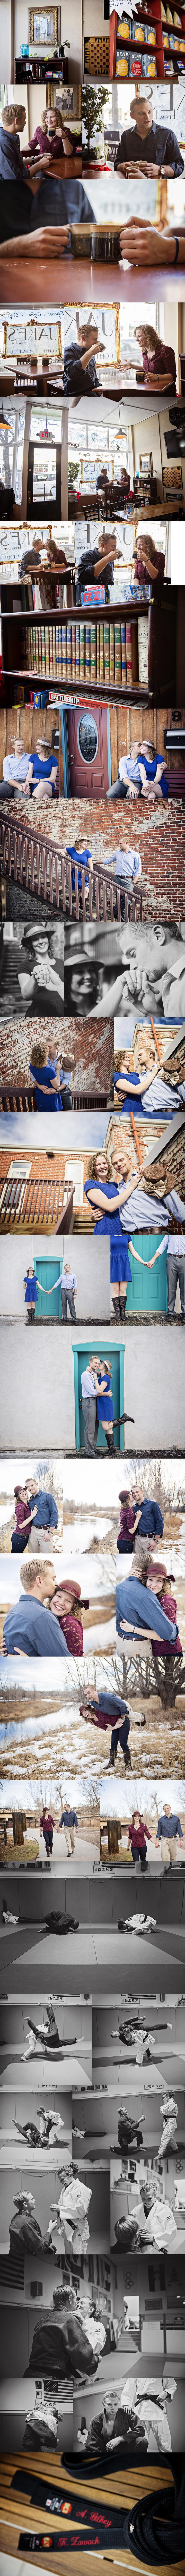 engagementphotography1.jpg